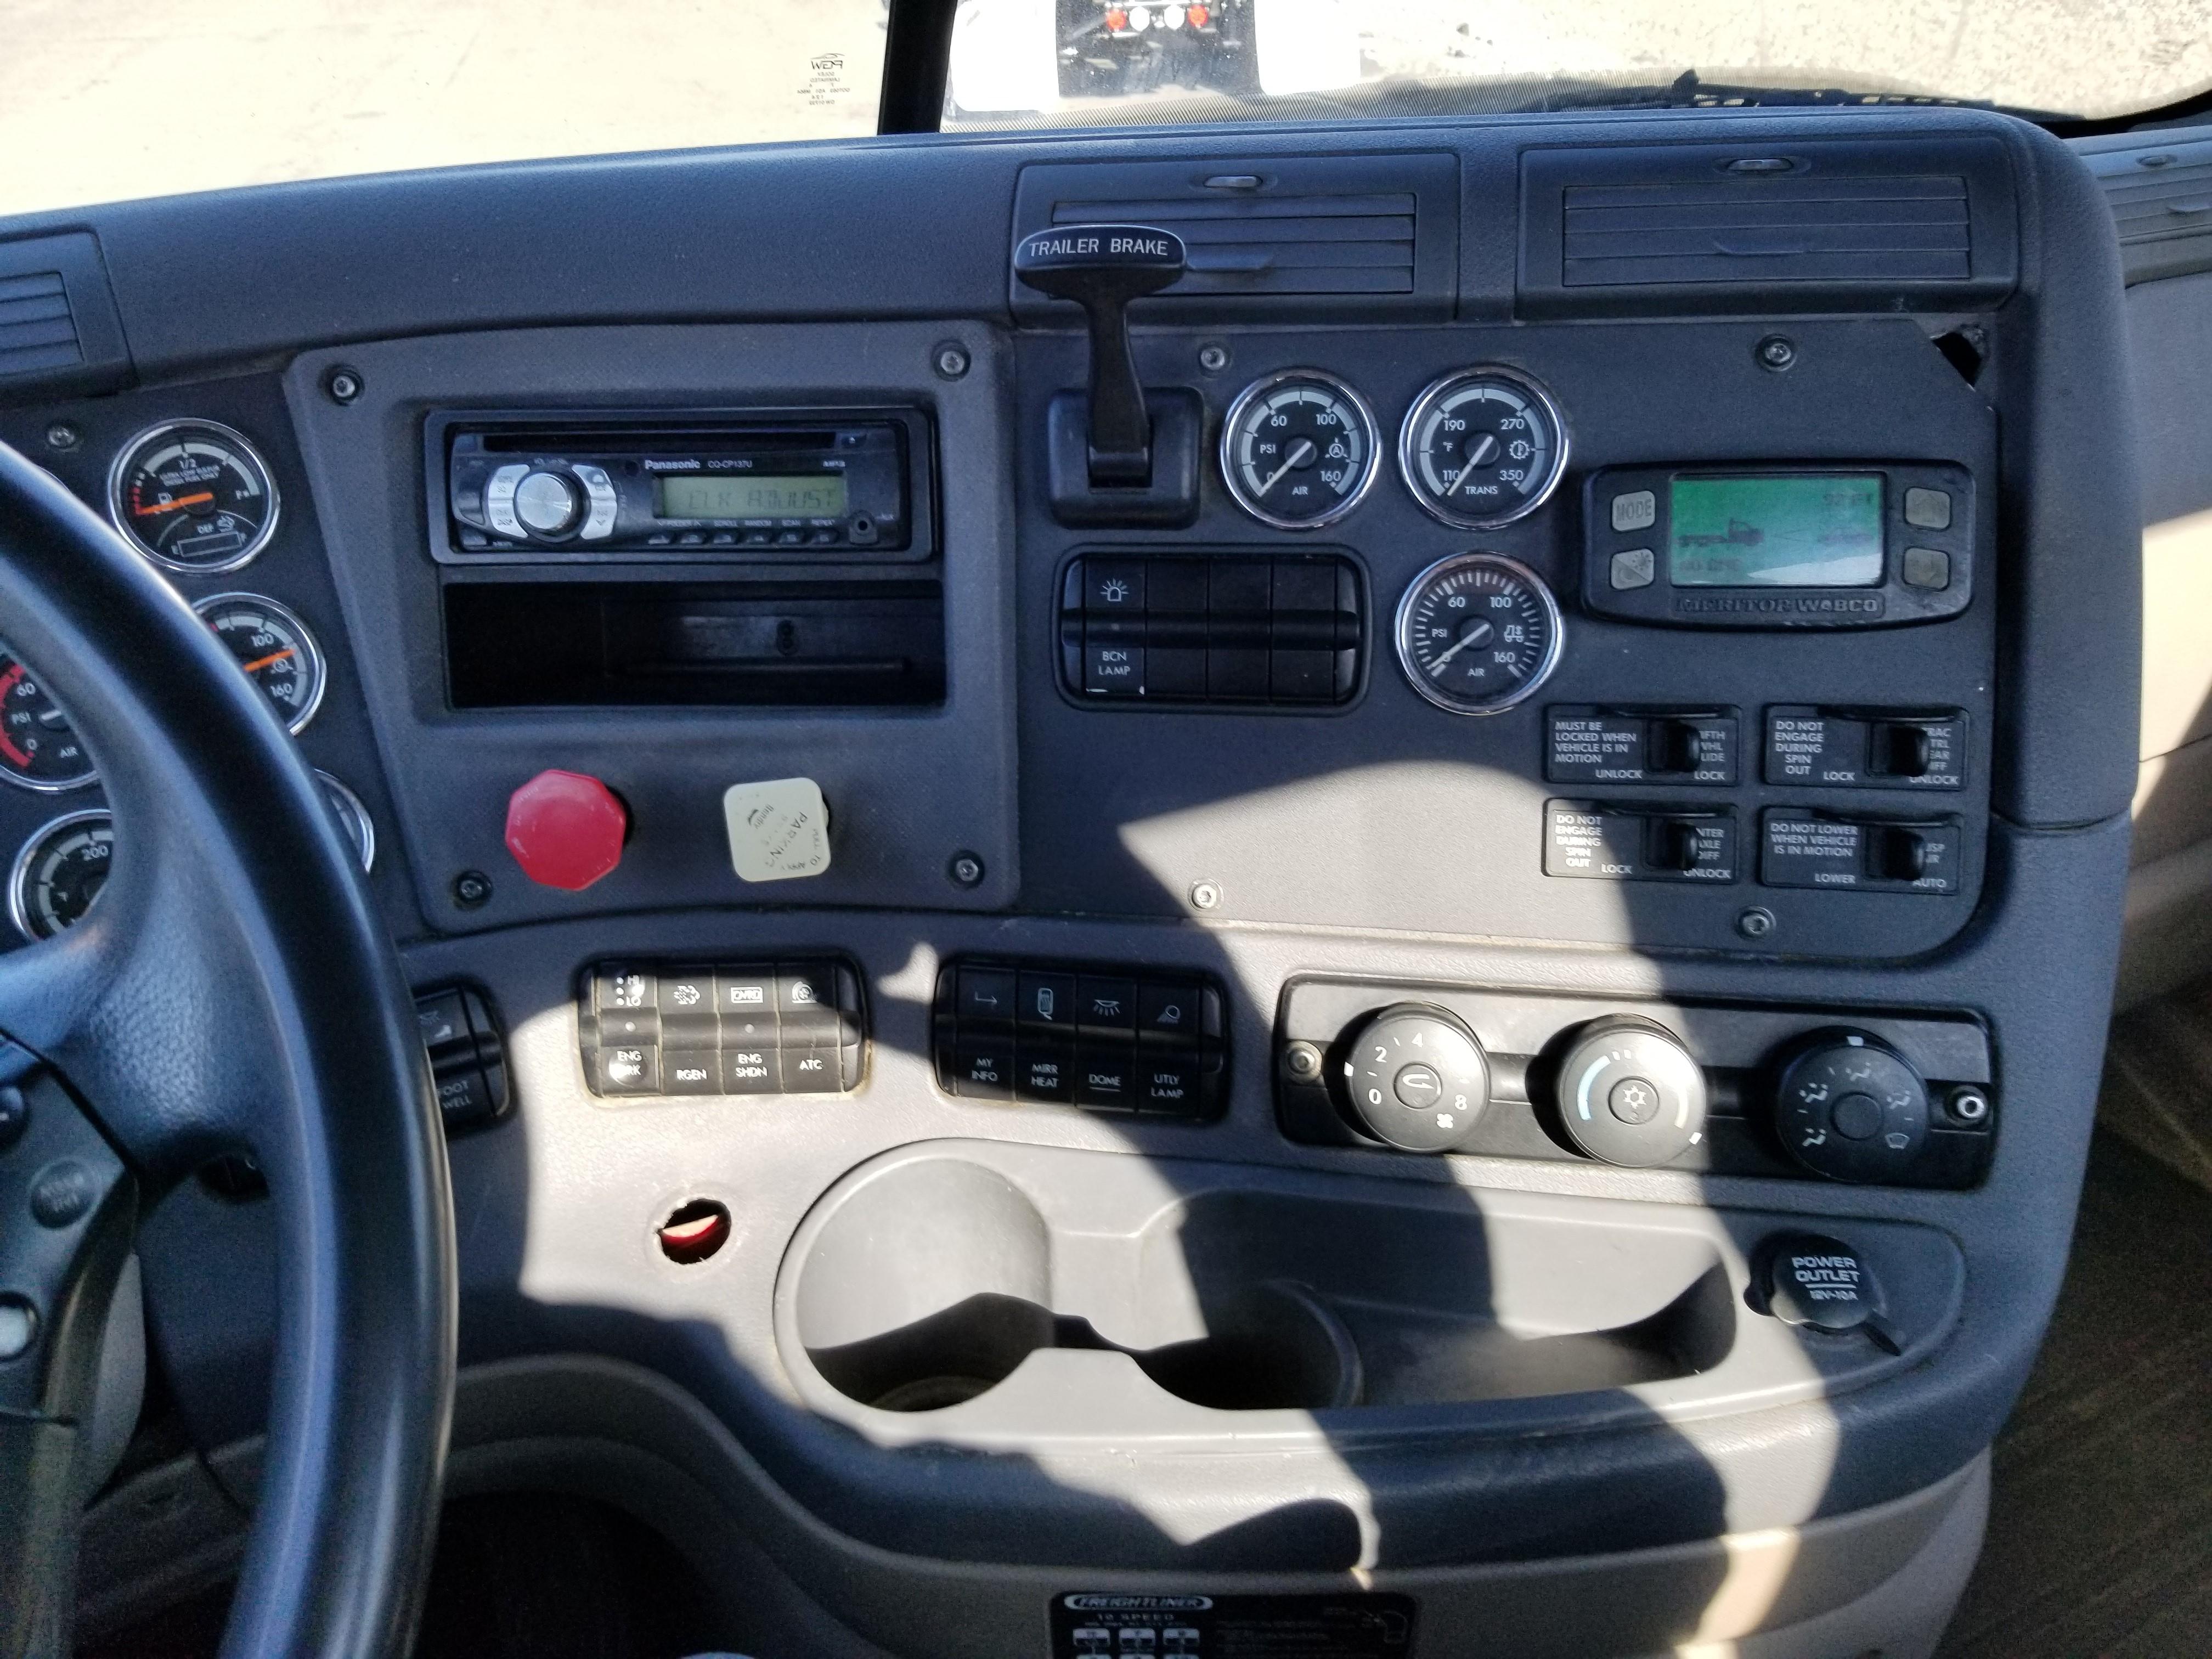 2014 Freightliner CASCAD